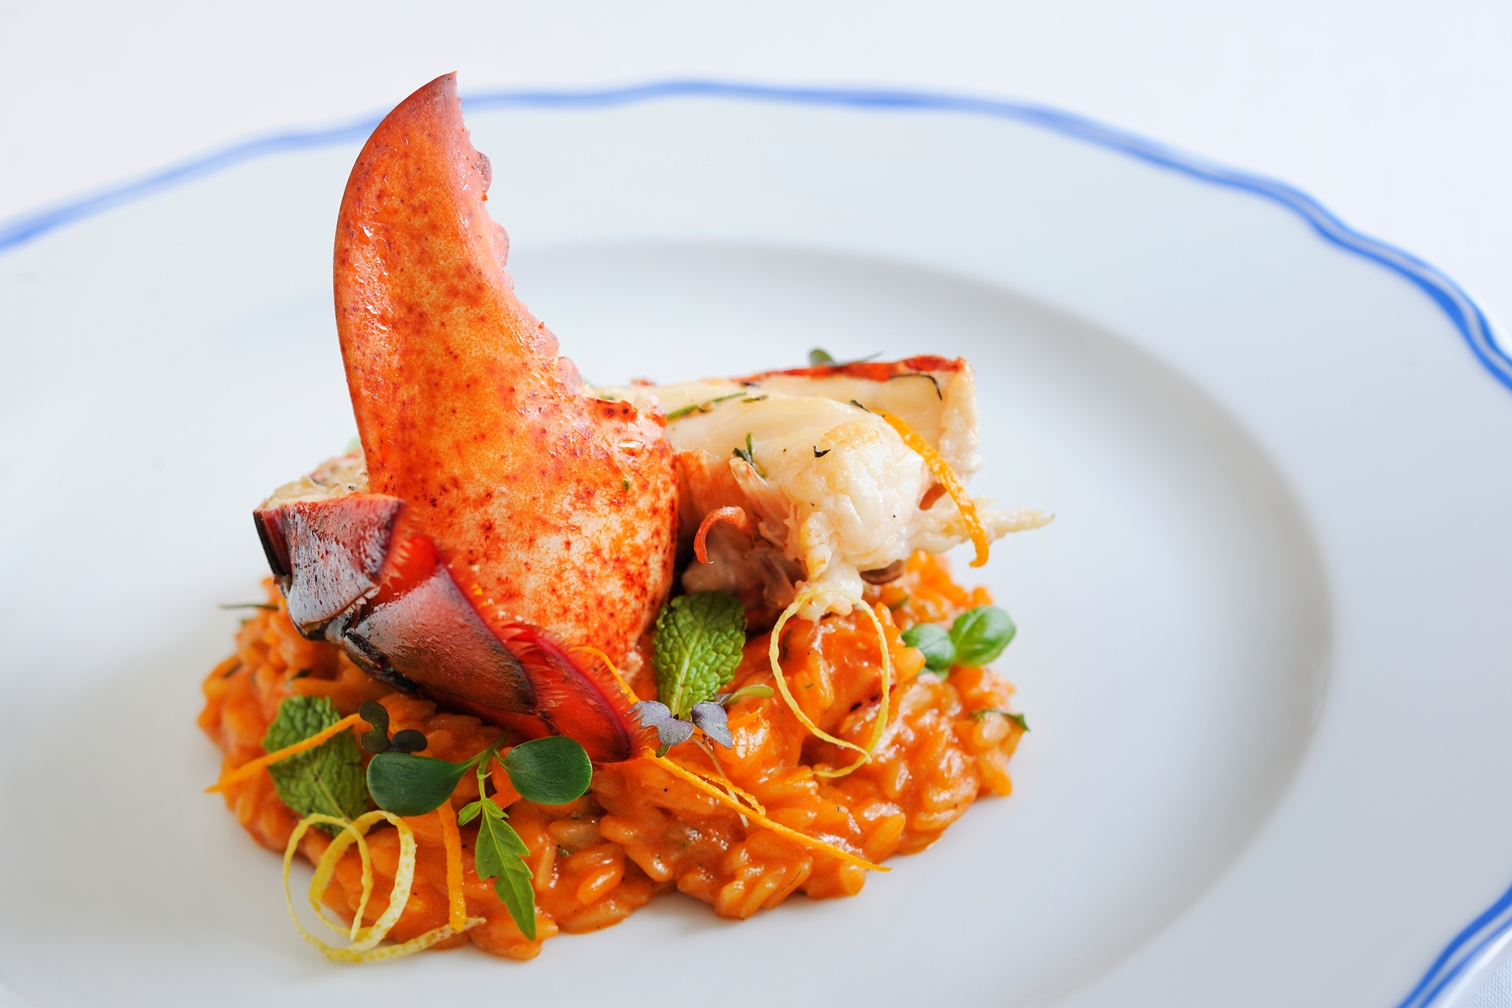 JW Marriott Marquis hosts 25 Italian Michelin-starred chefs | Hotel News ME